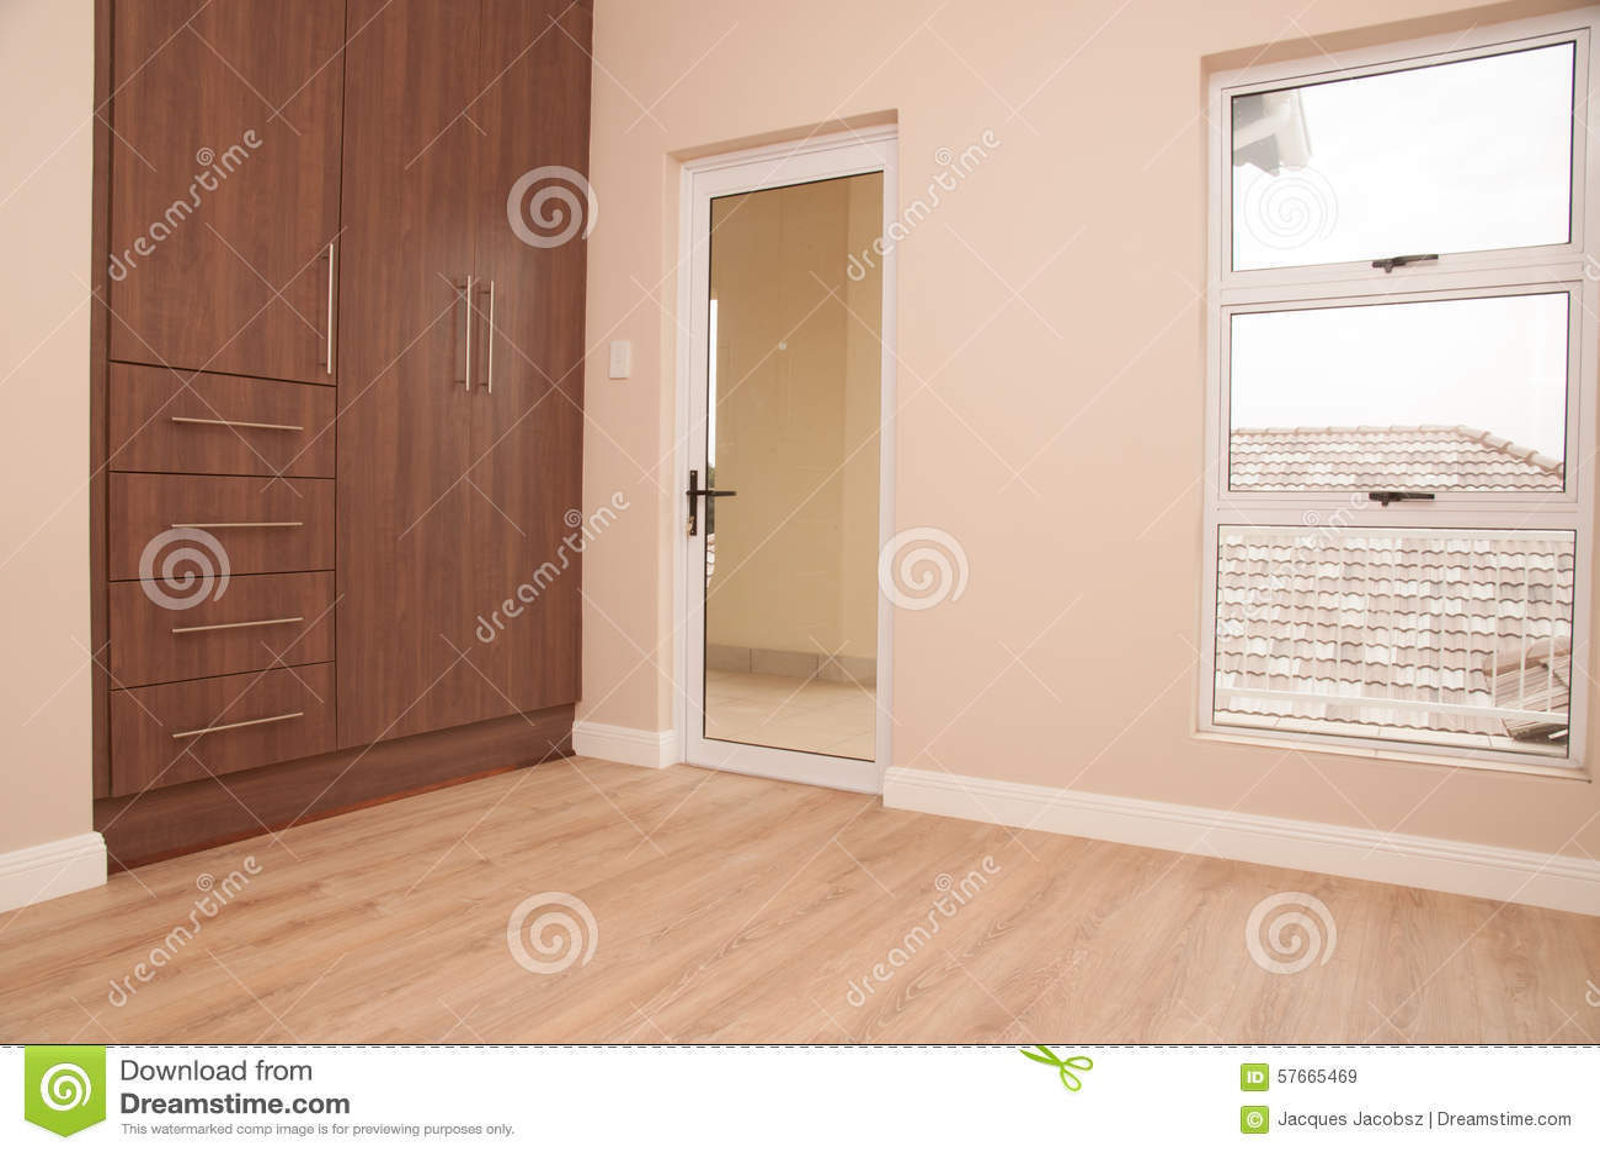 Empty Bedroom With Balcony Stock Image Image Of Bedroom 57665469